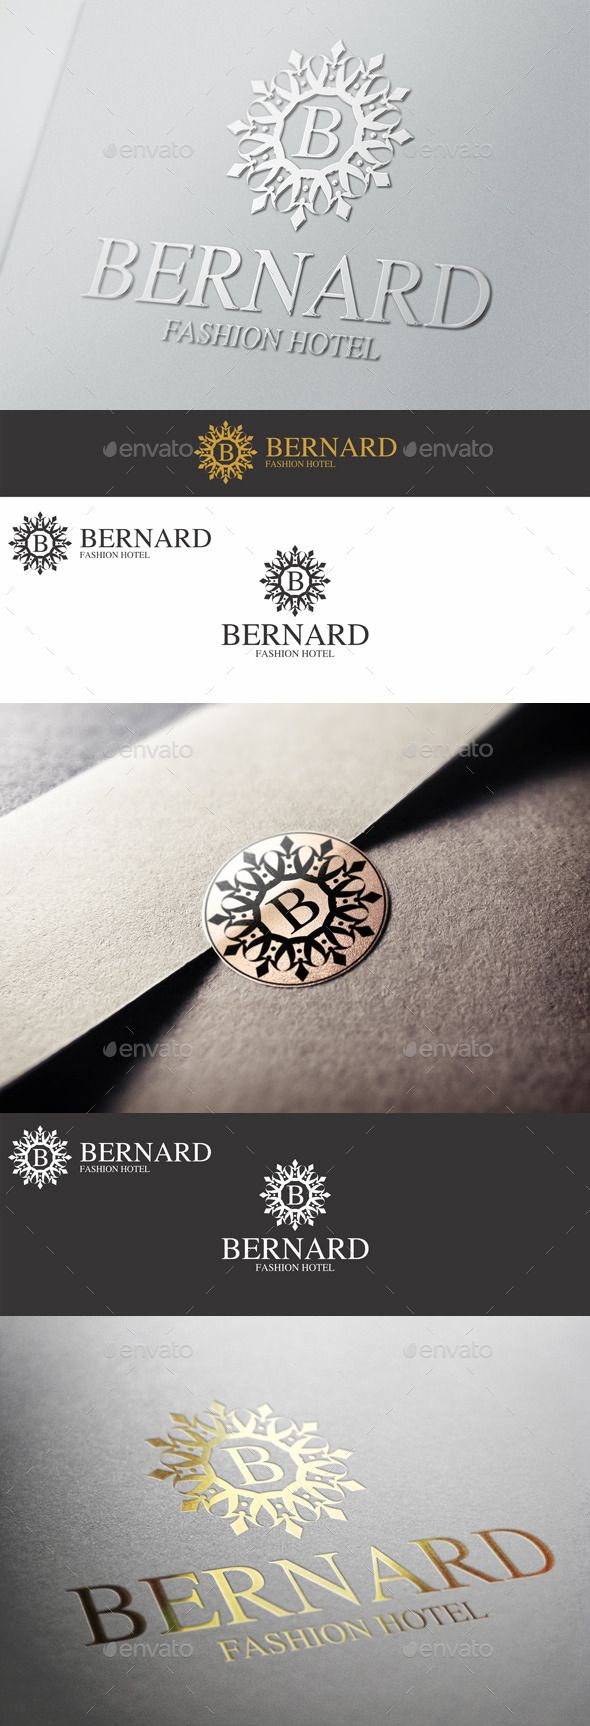 Boutique Elegant Logo Emblem  Bernard — Vector EPS #luxurious #victorian • Available here → https://graphicriver.net/item/boutique-elegant-logo-emblem-bernard/10607195?ref=pxcr